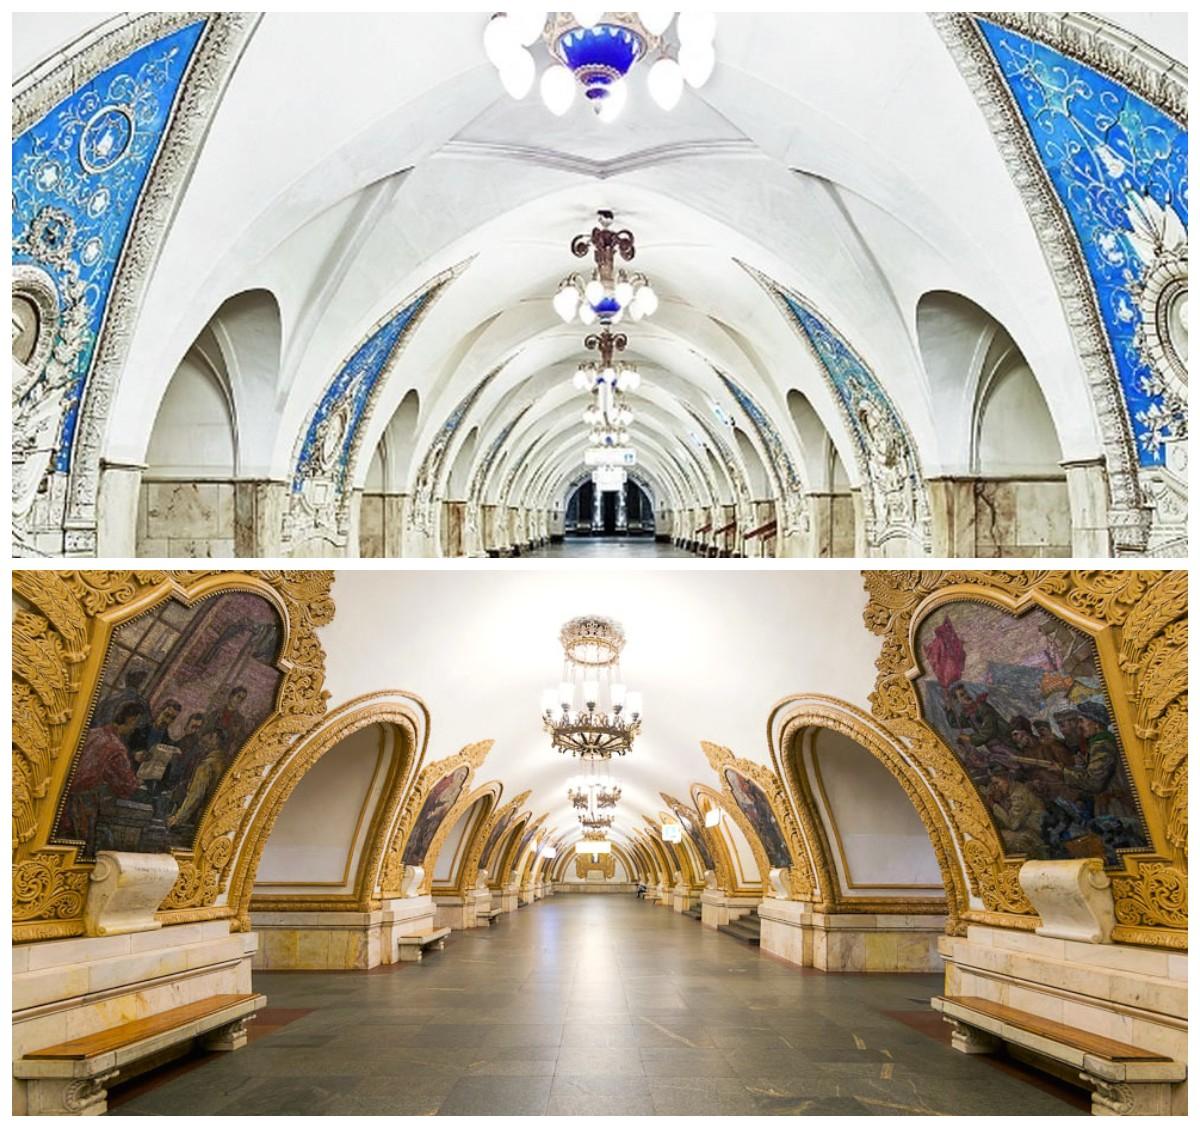 Памятник архитектуры под землей